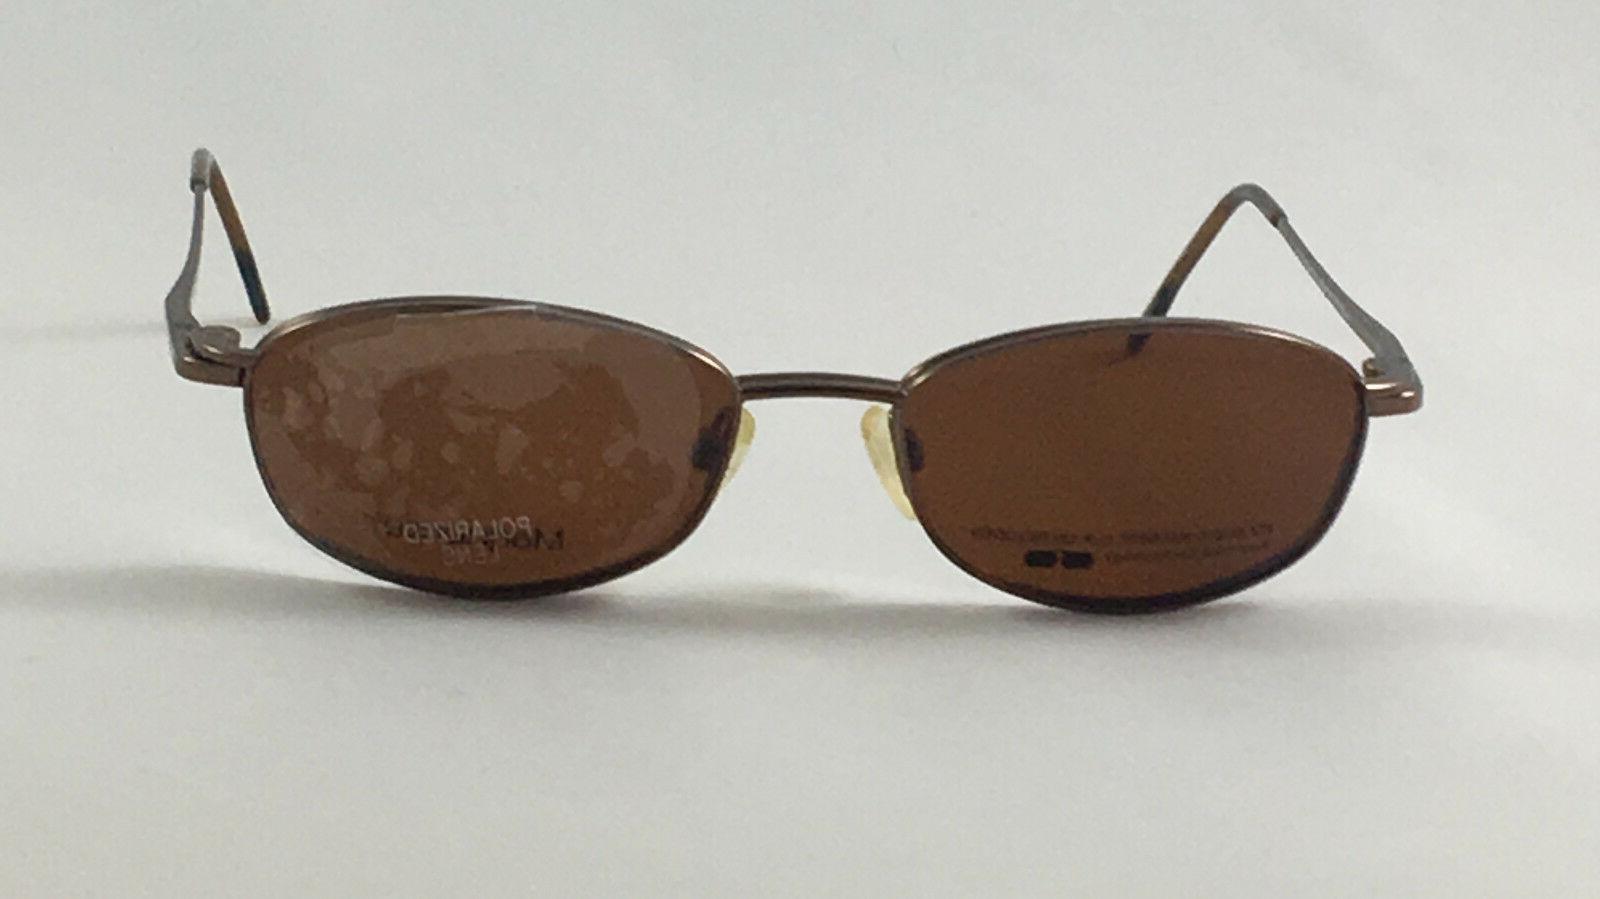 New Men's W/ On Sunglasses